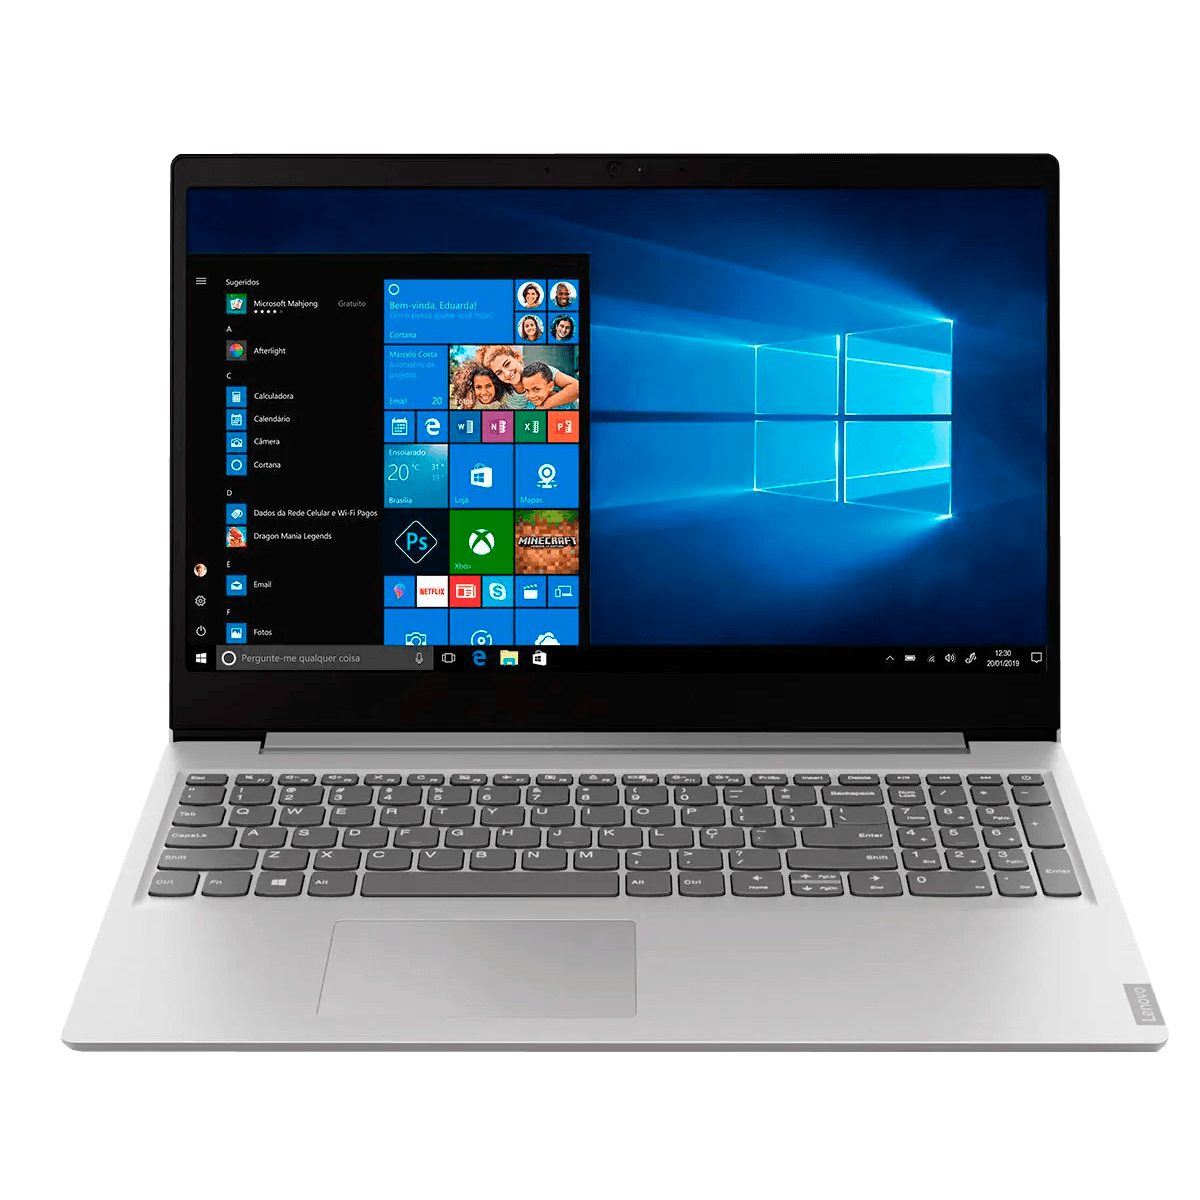 Notebook Lenovo Ideapad S145 Intel Core i3 4GB 1TB LCD Windows 10 Home - 82DJ0002BR